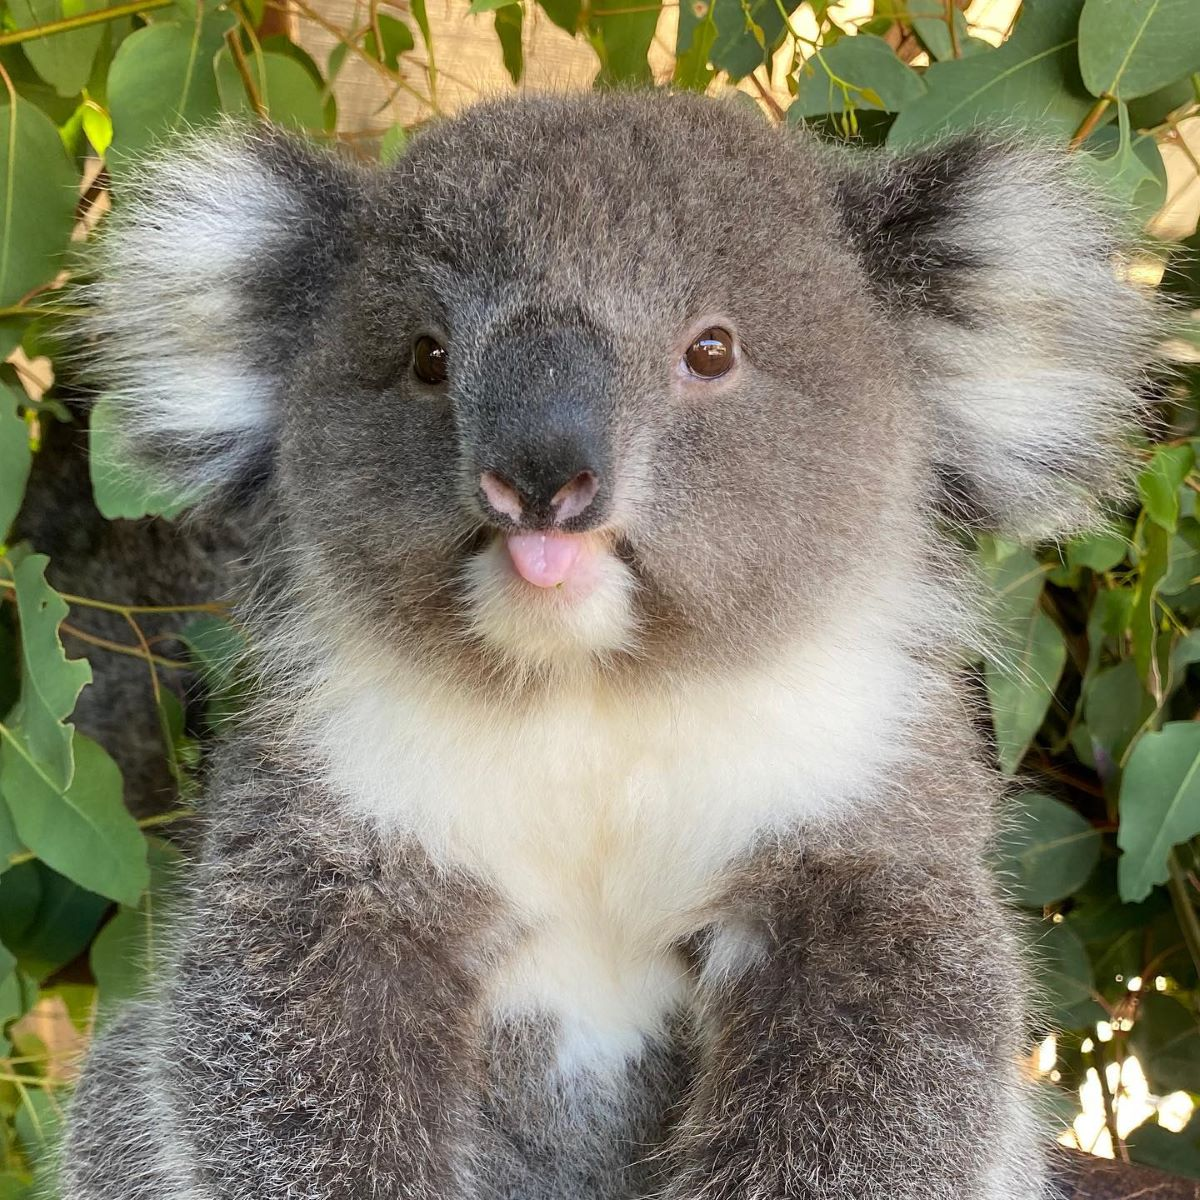 Koala with tongue poking out